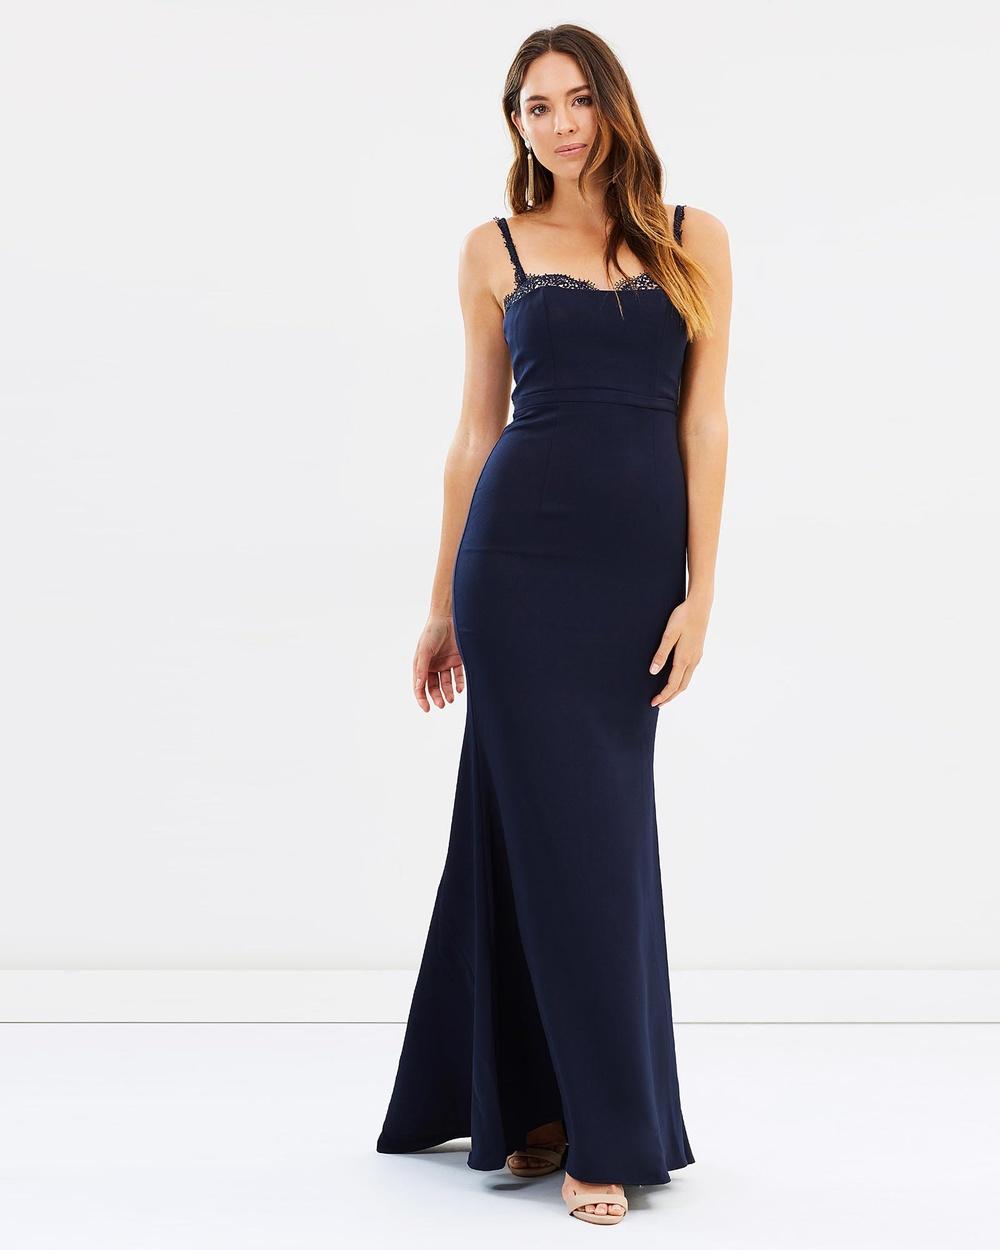 Love Honor Dena Gown Bridesmaid Dresses Navy Dena Gown